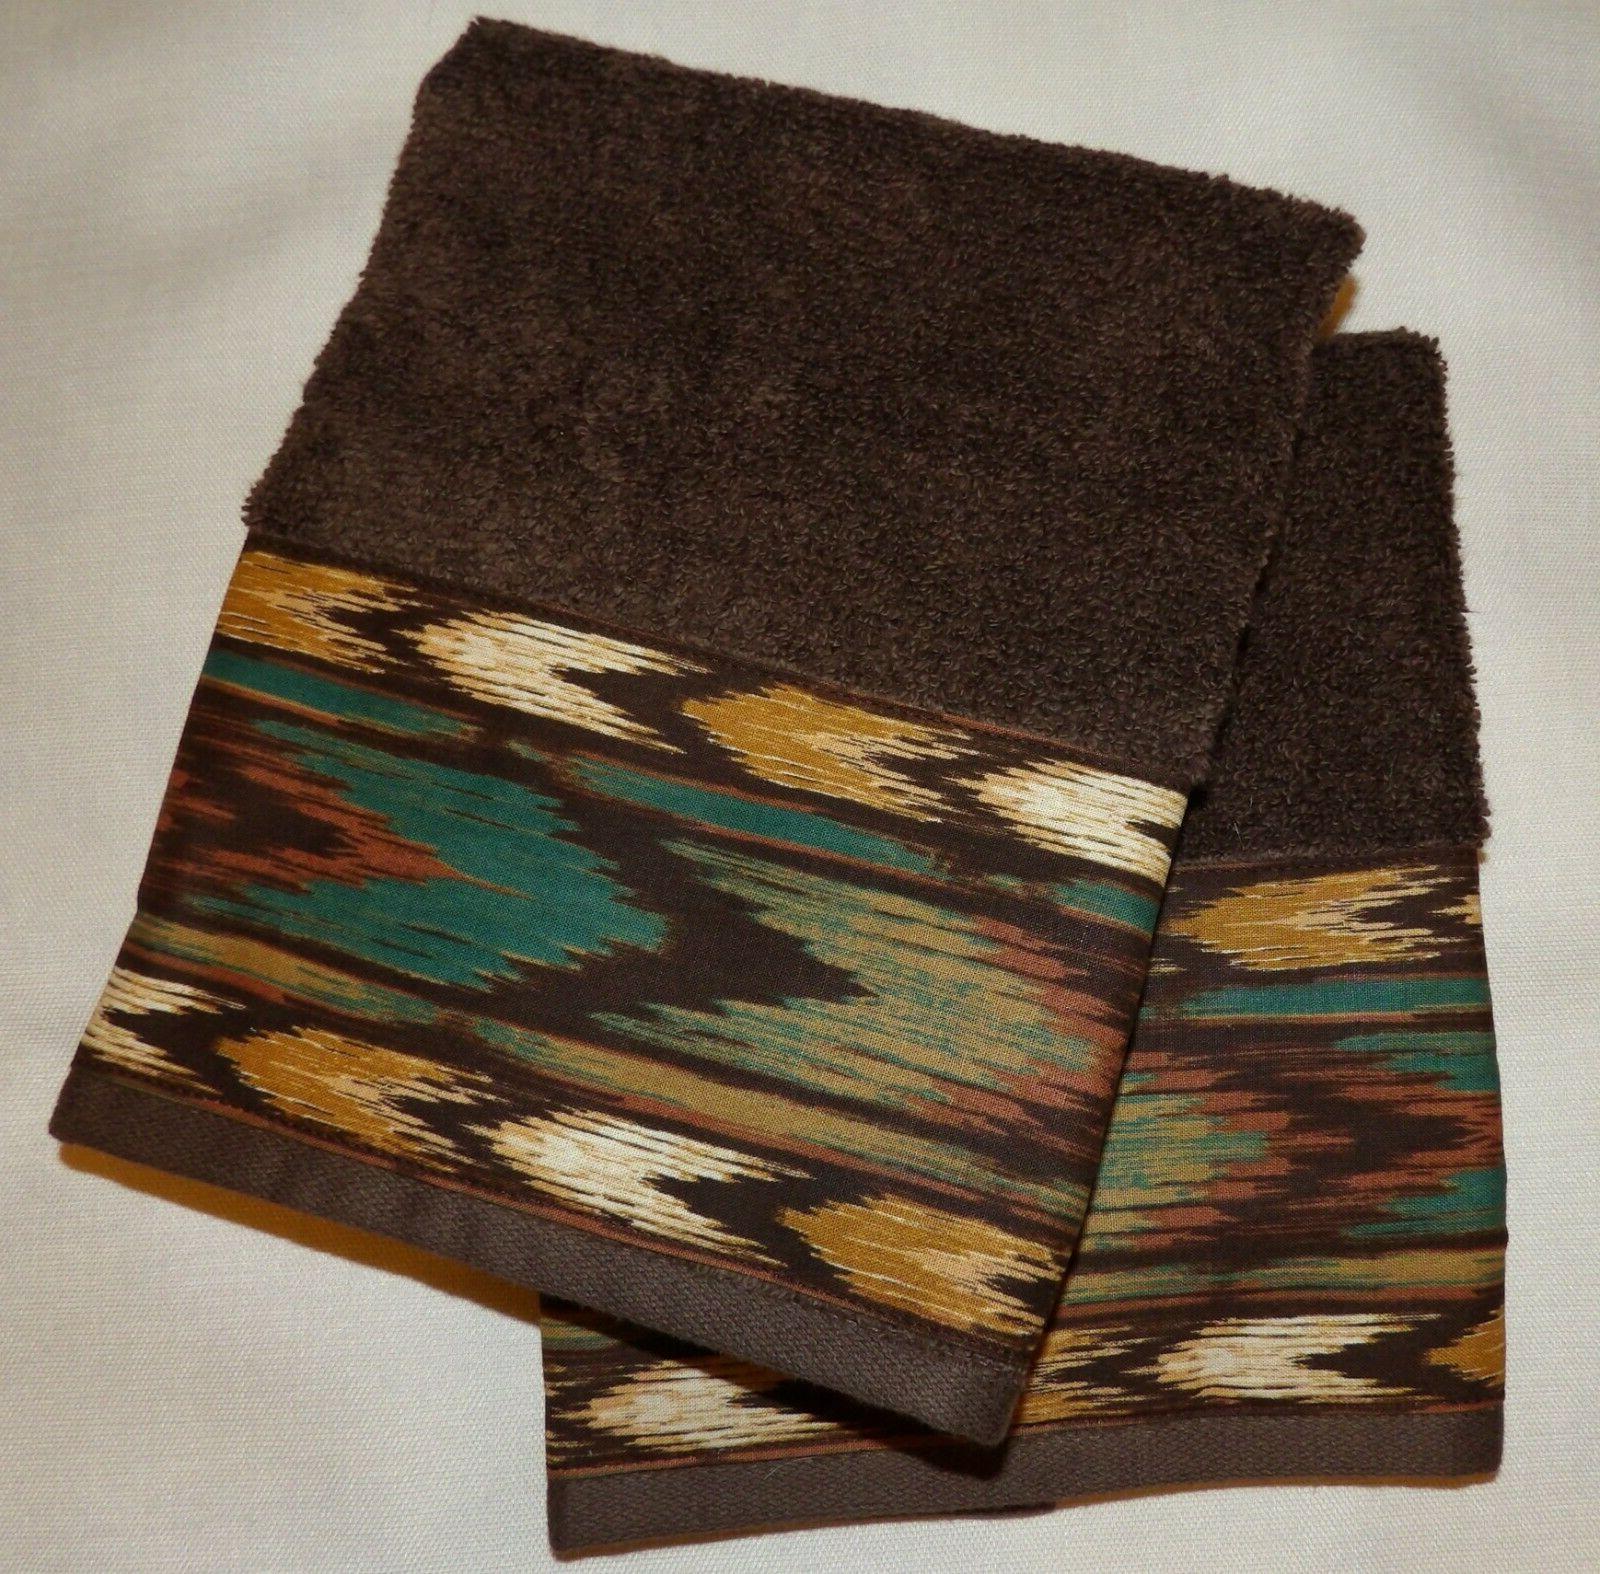 SOUTHWEST/WESTERN/CABIN HAND TOWELS, SET BROWN,AZTEC